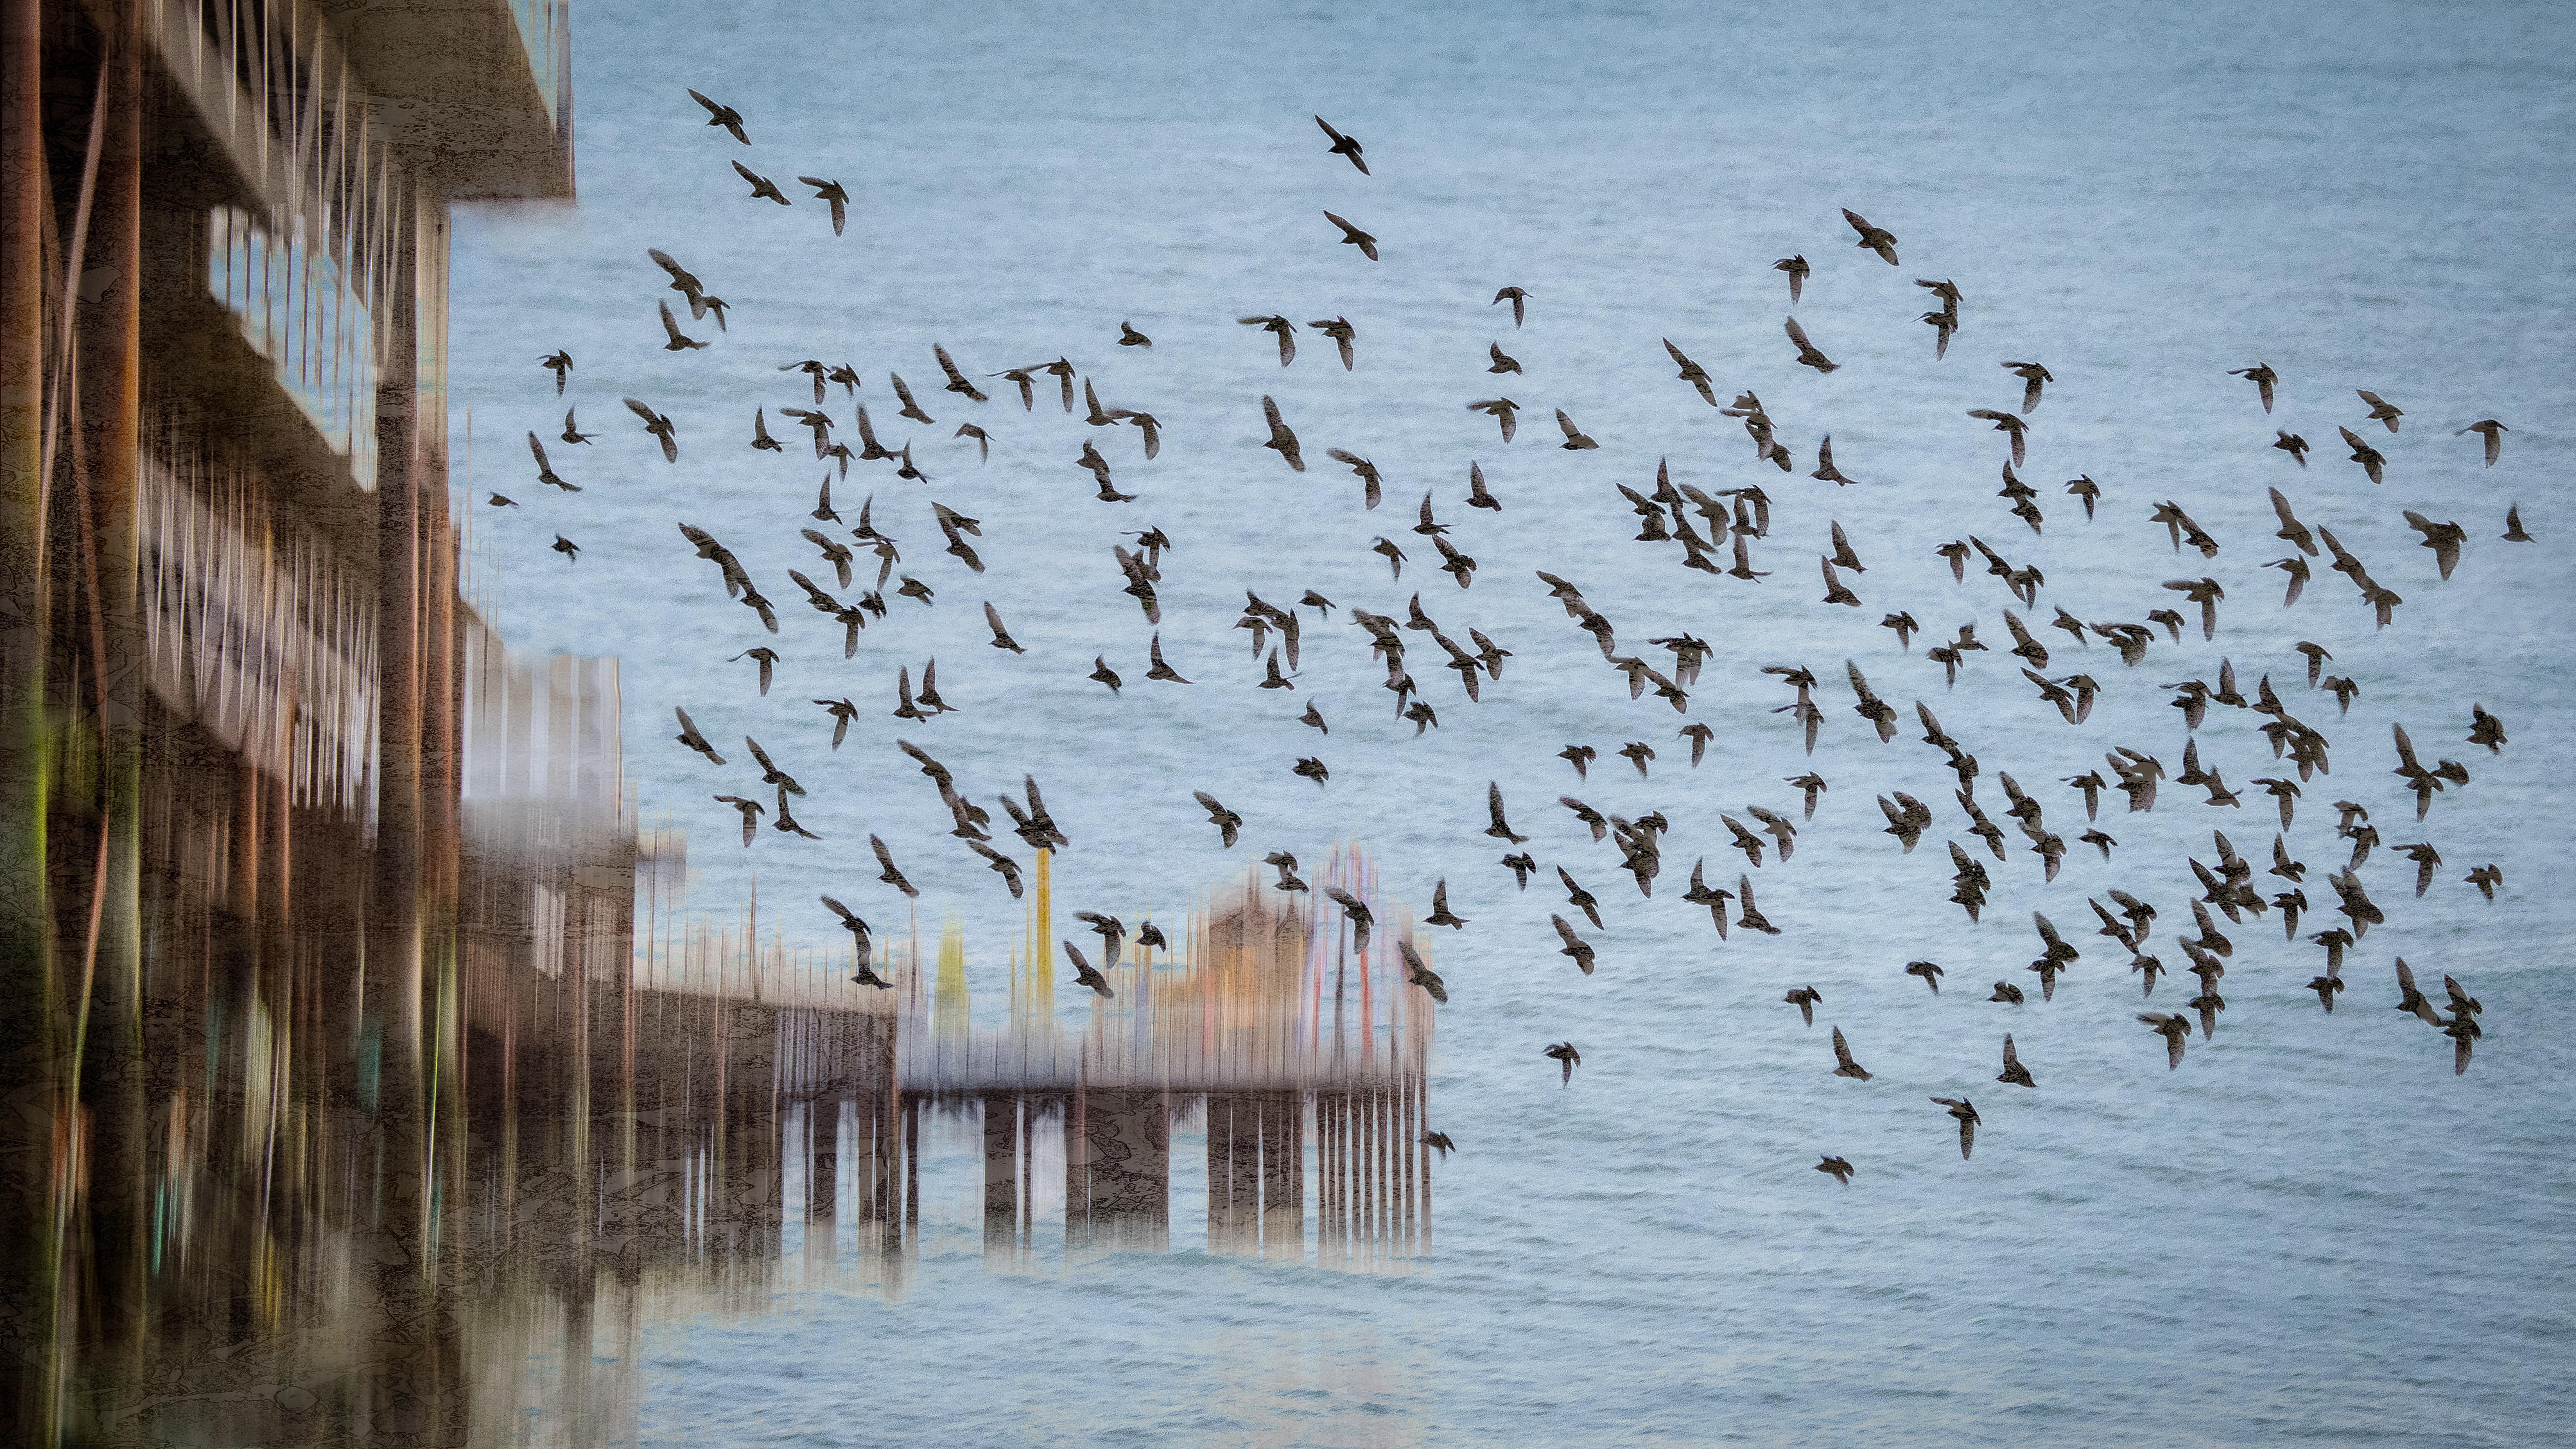 Pier and Murmuration